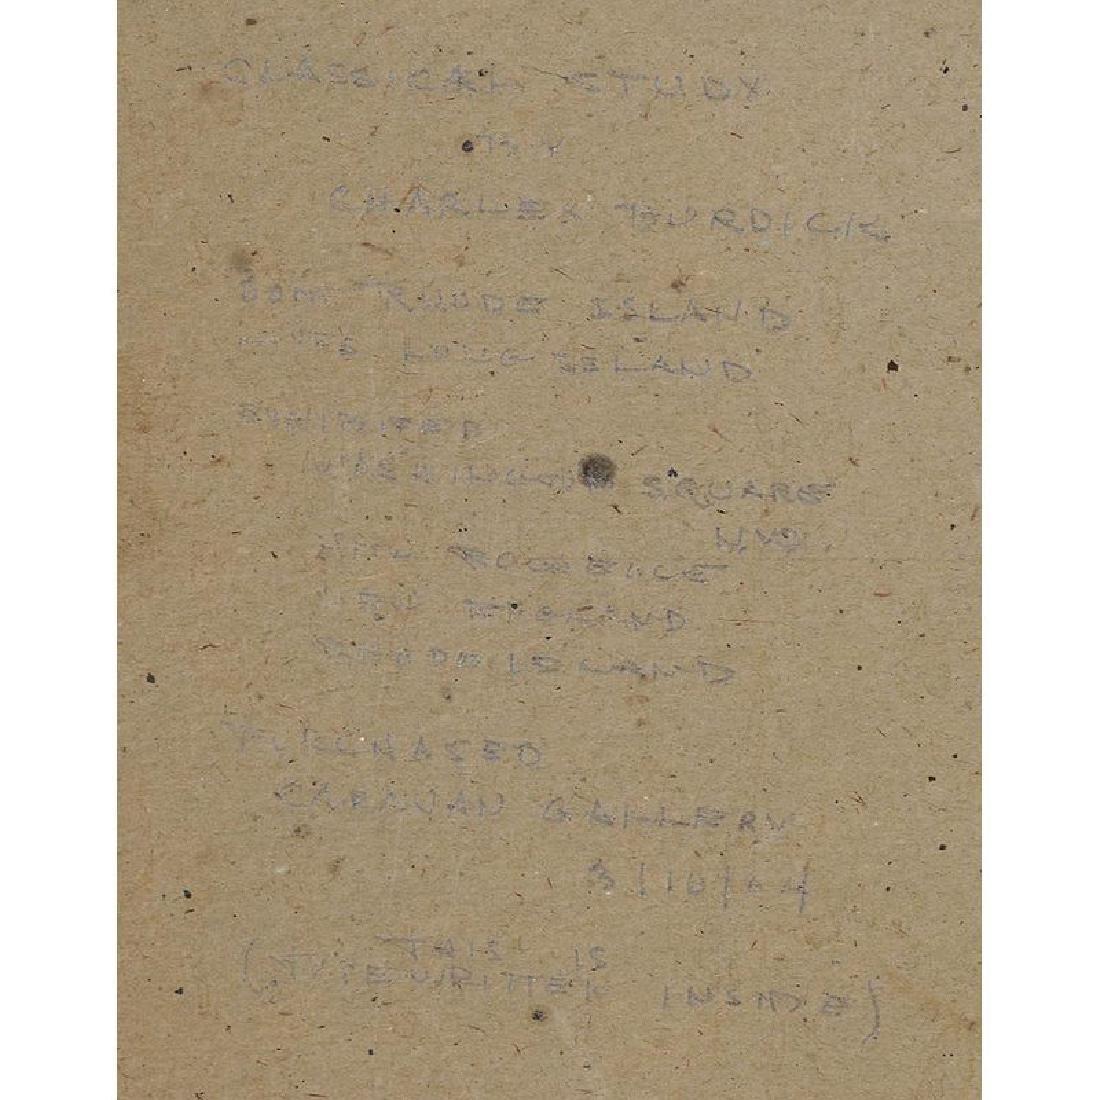 Charles Edward Burdick - 4